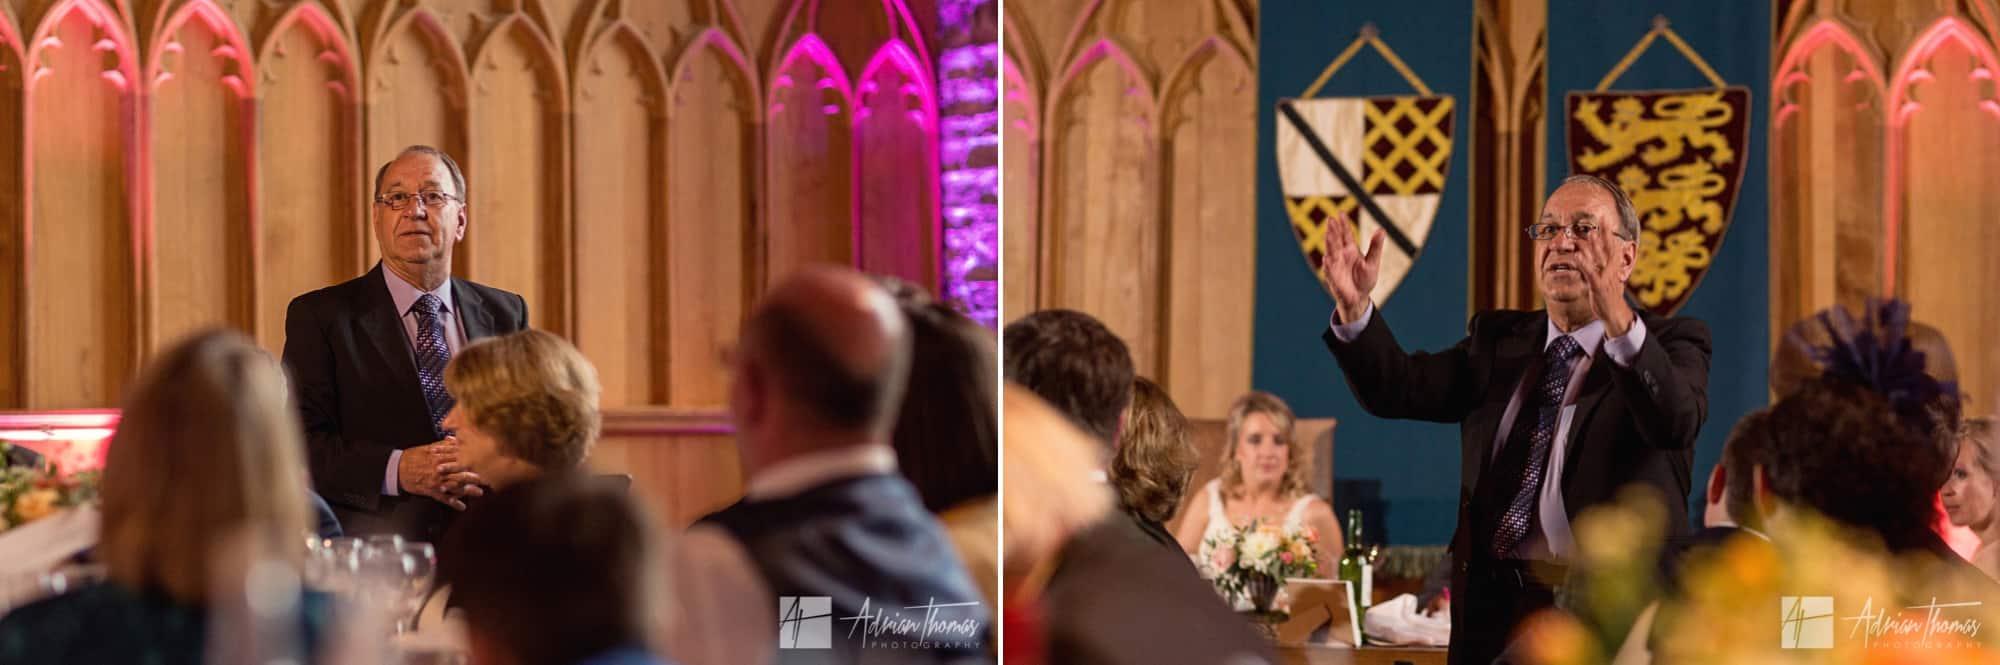 Speech at wedding.